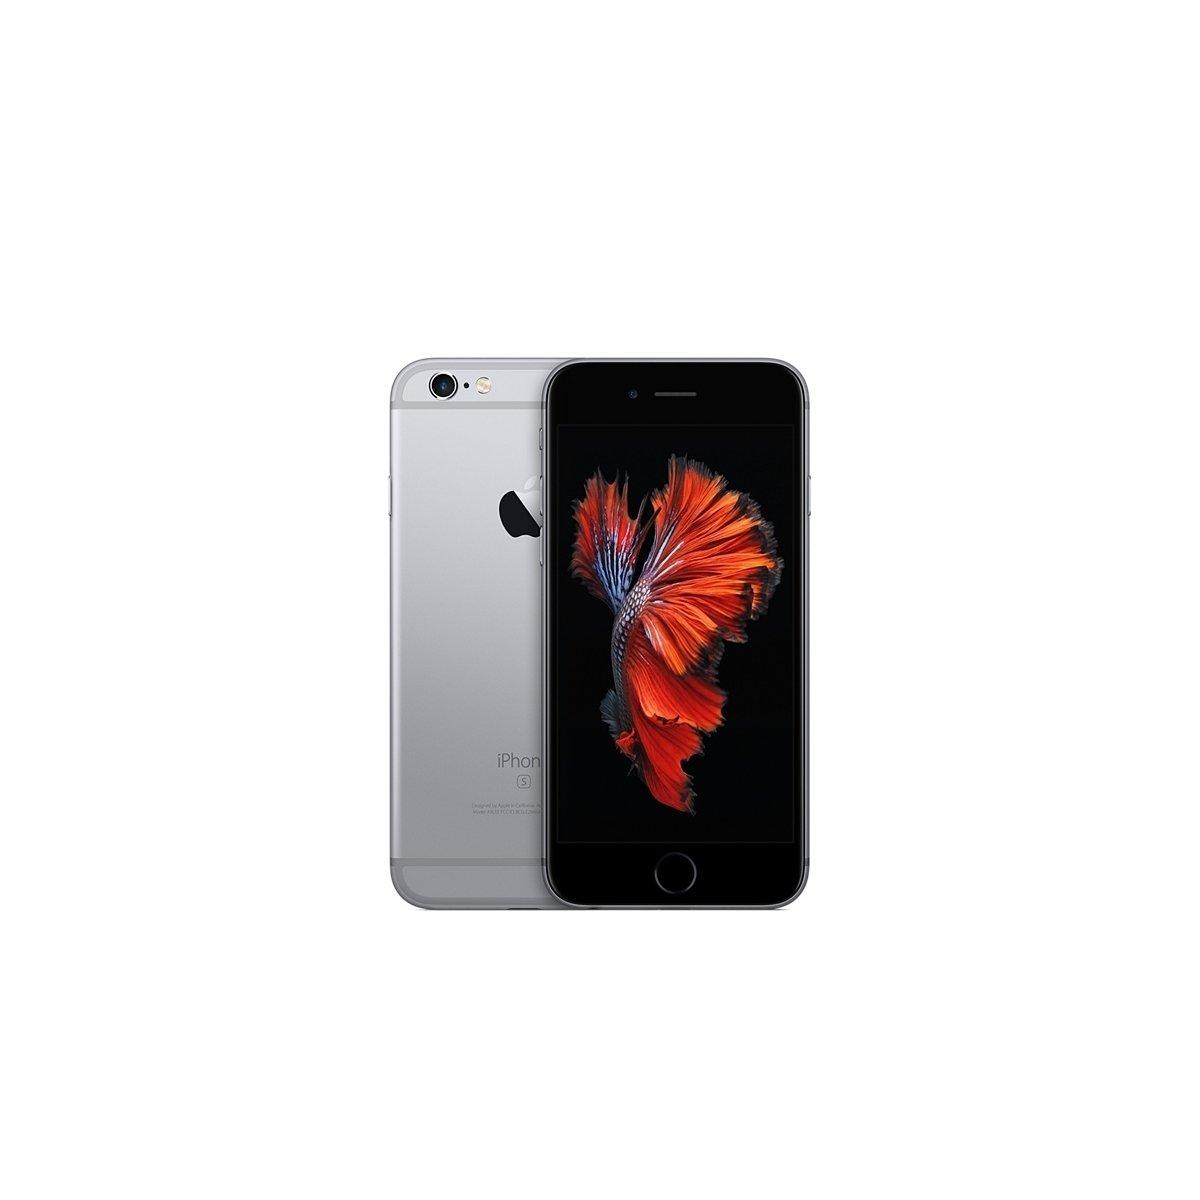 Apple iPhone 6S 64GB LTE Verizon,Space Gray (Renewed) by Apple